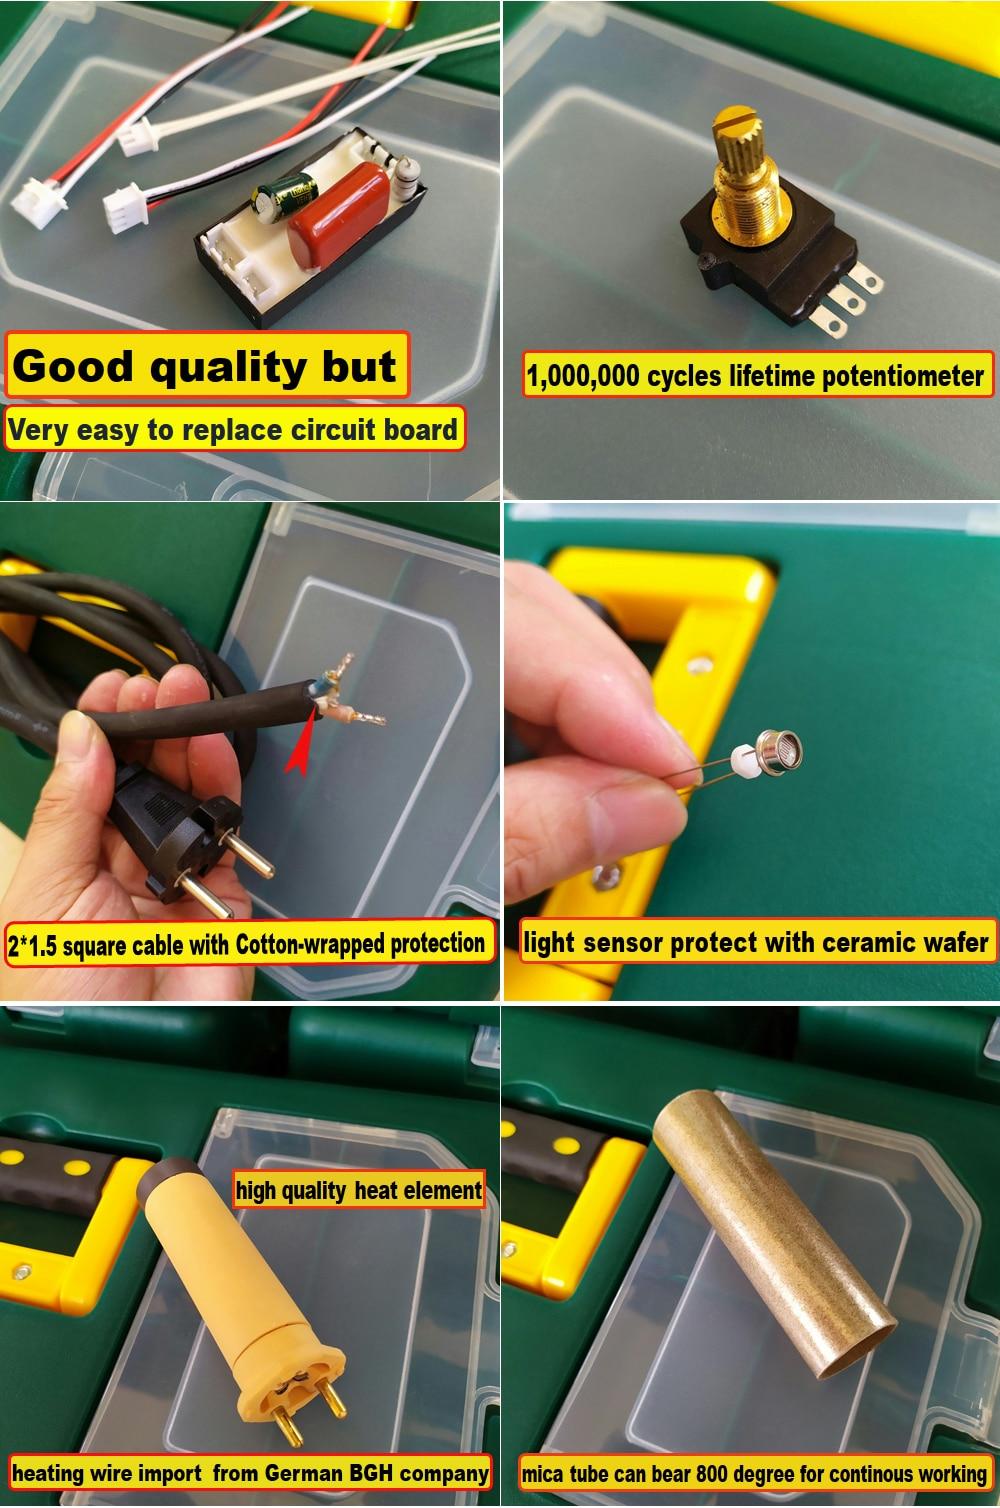 Pistola termica per saldatura di plastica a saldare ad aria calda - Attrezzatura per saldare - Fotografia 6